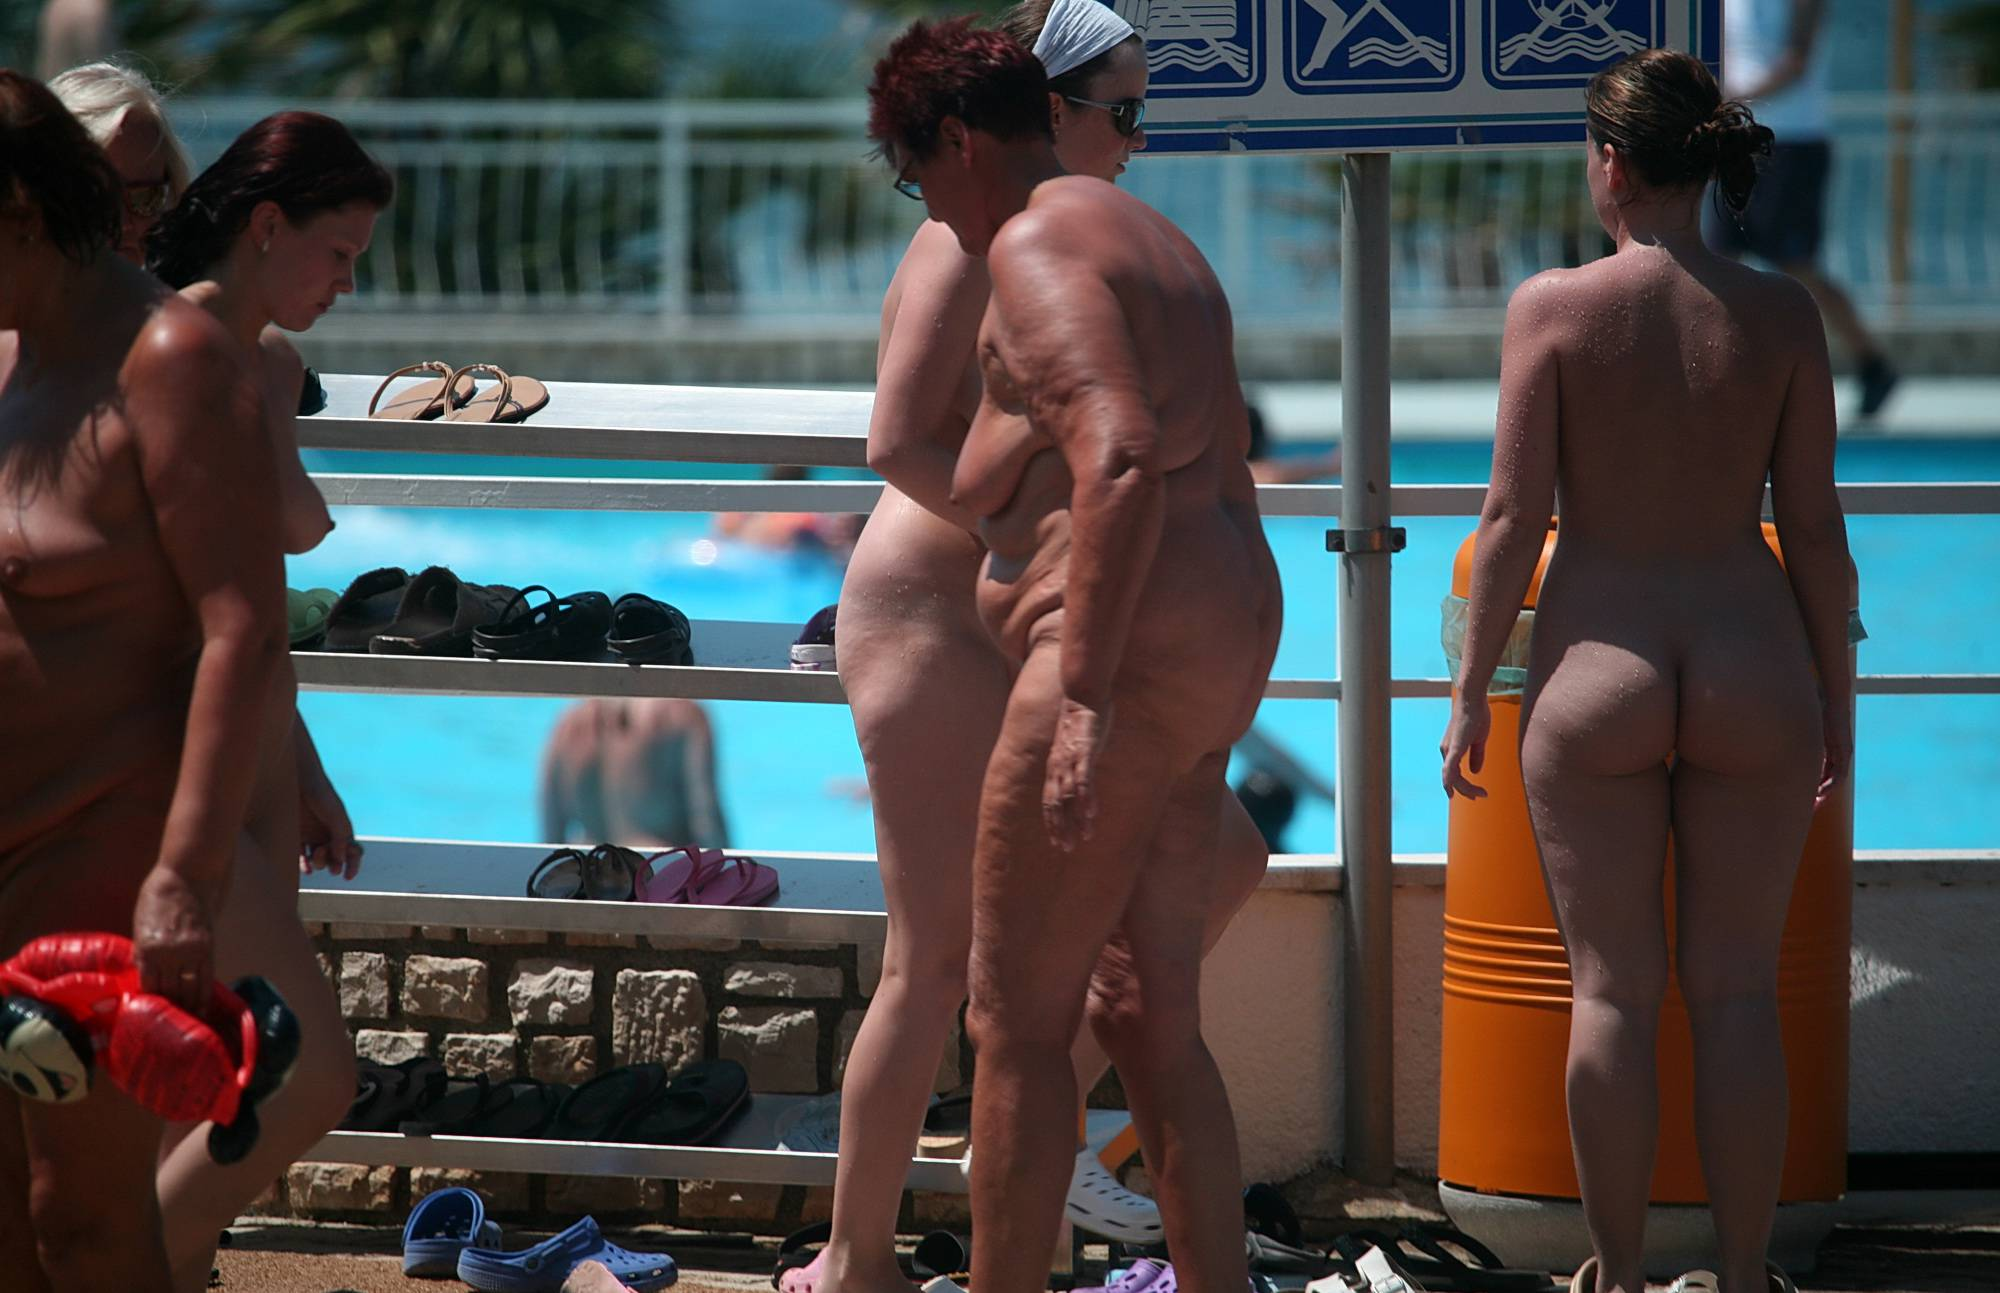 Nudist Gallery Sun-Soaked Sidewalk - 2